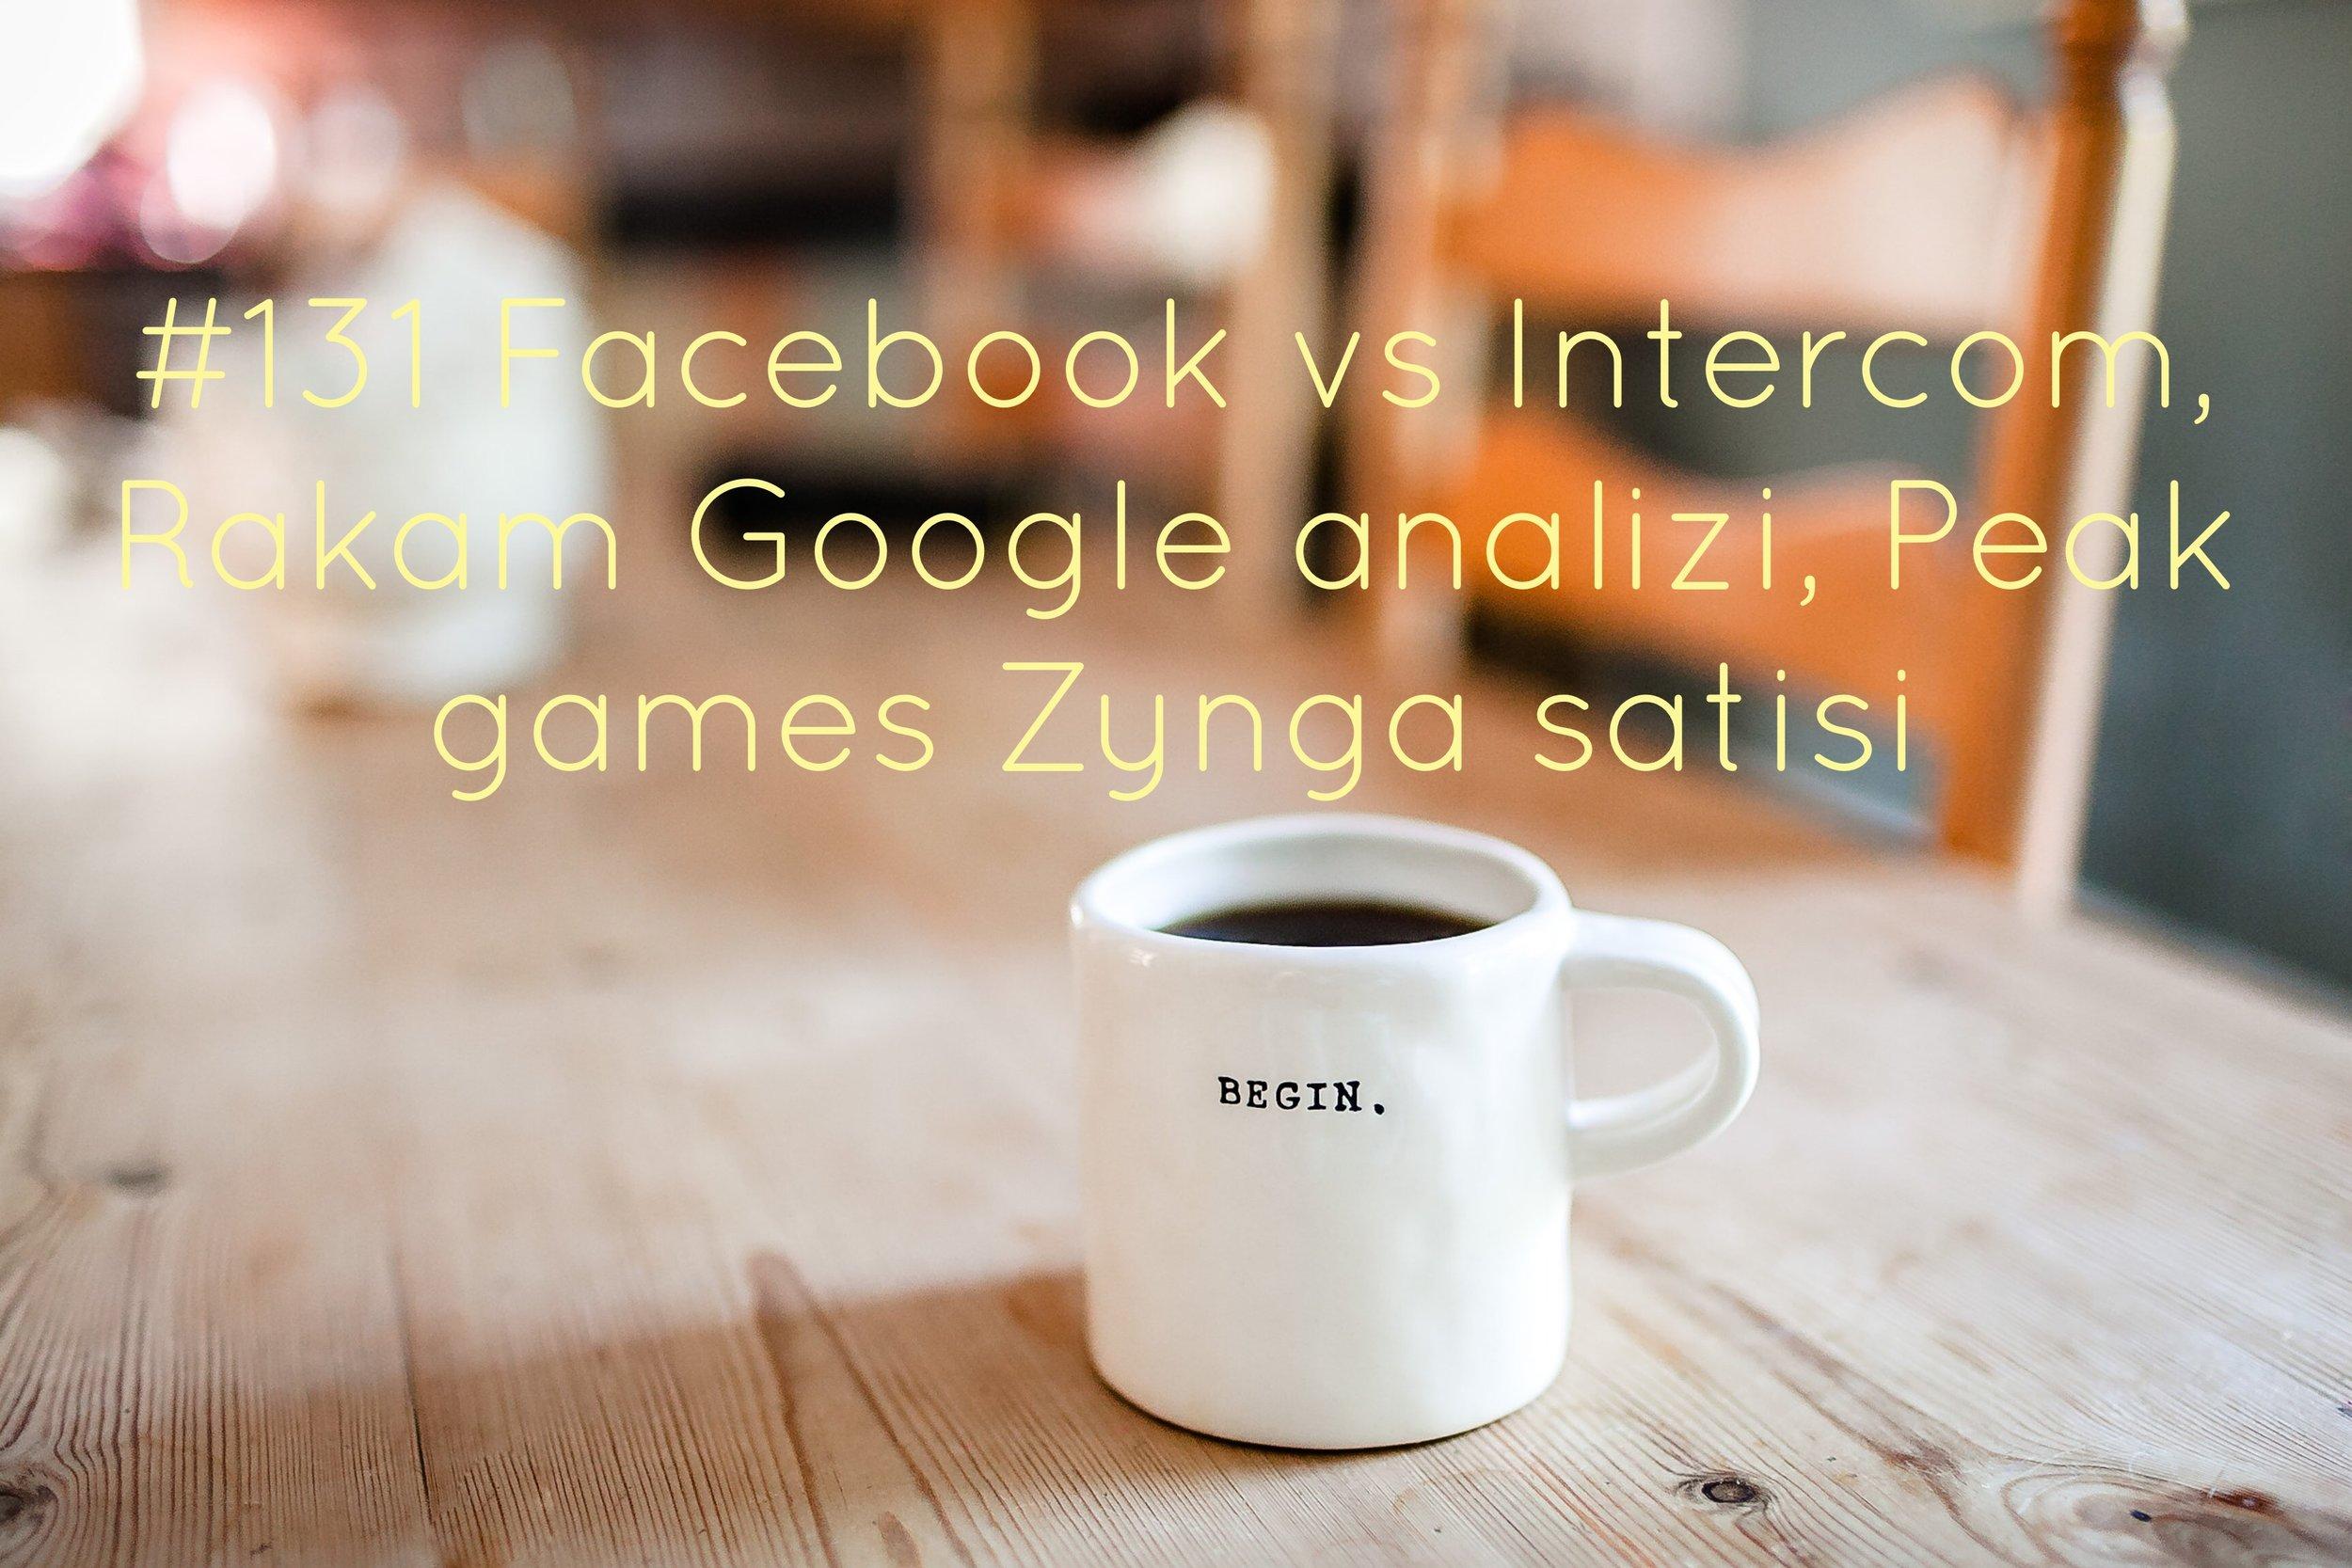 facebook vs intercom